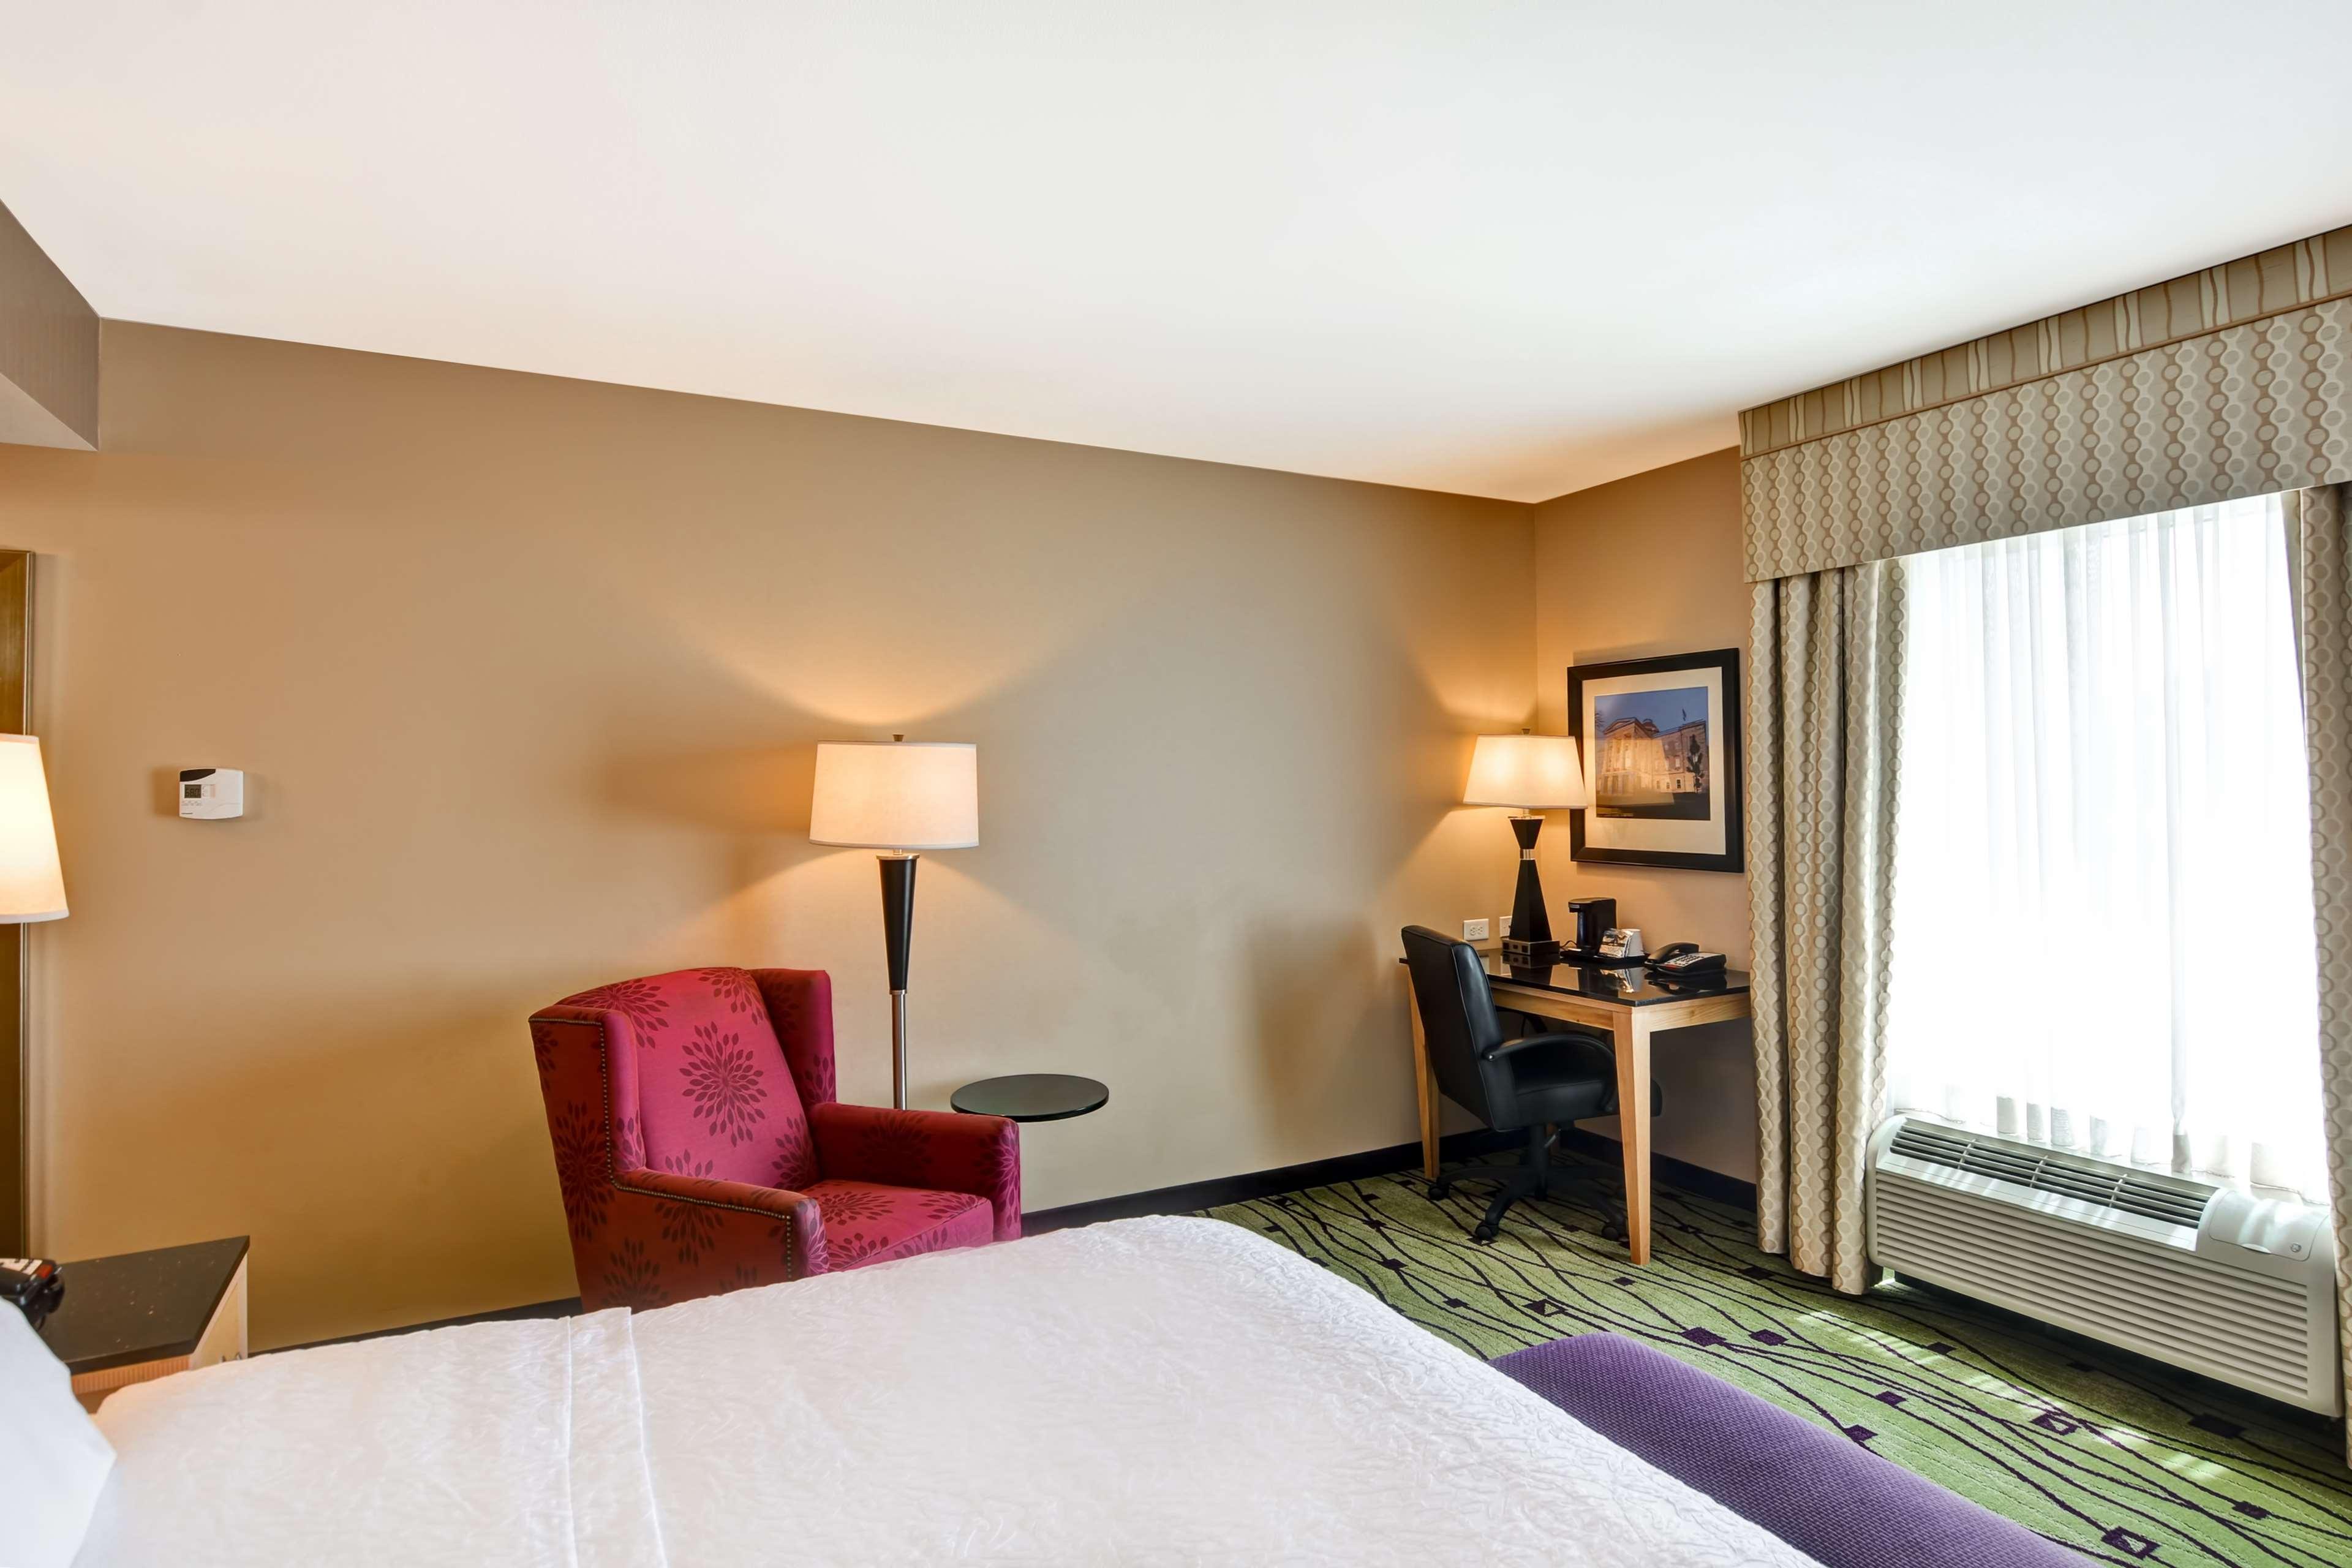 Hampton Inn & Suites Raleigh/Crabtree Valley image 36